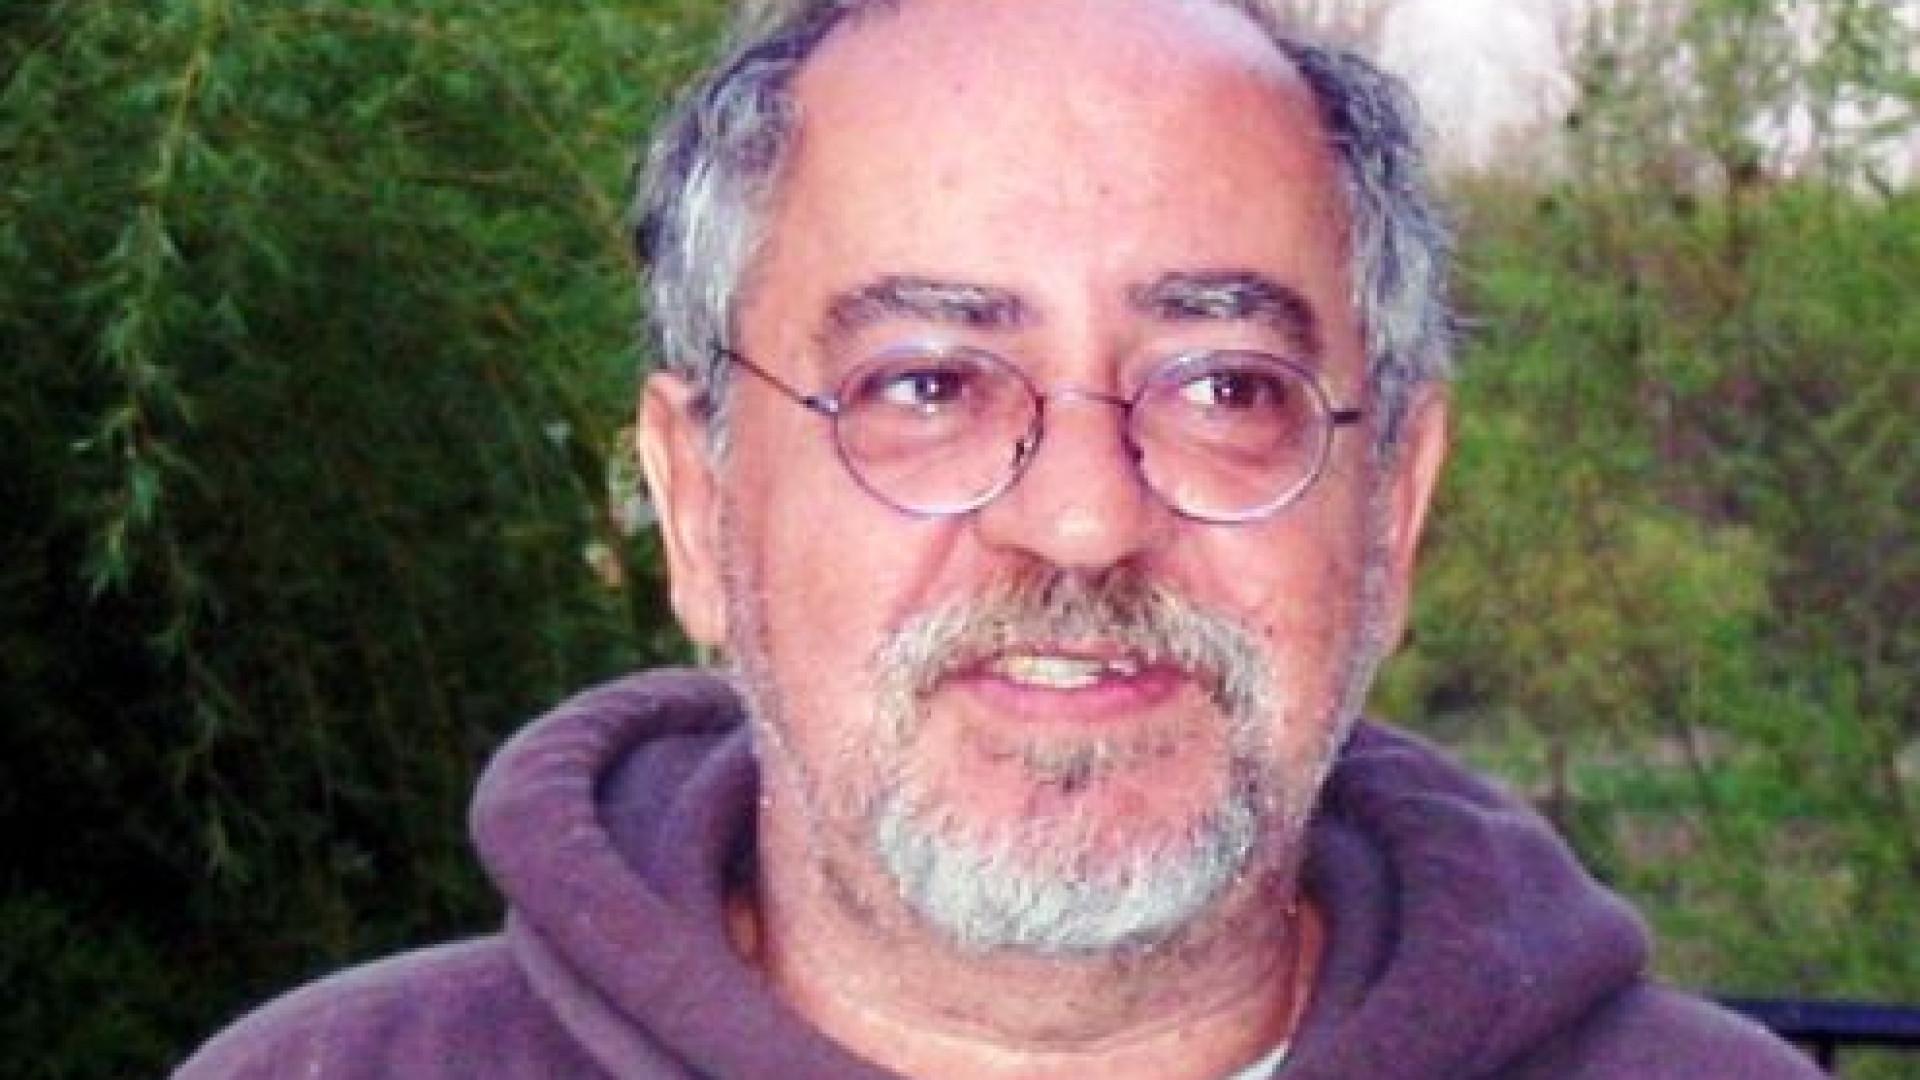 Escritor e antologista Flávio Moreira da Costa morre aos 77 anos